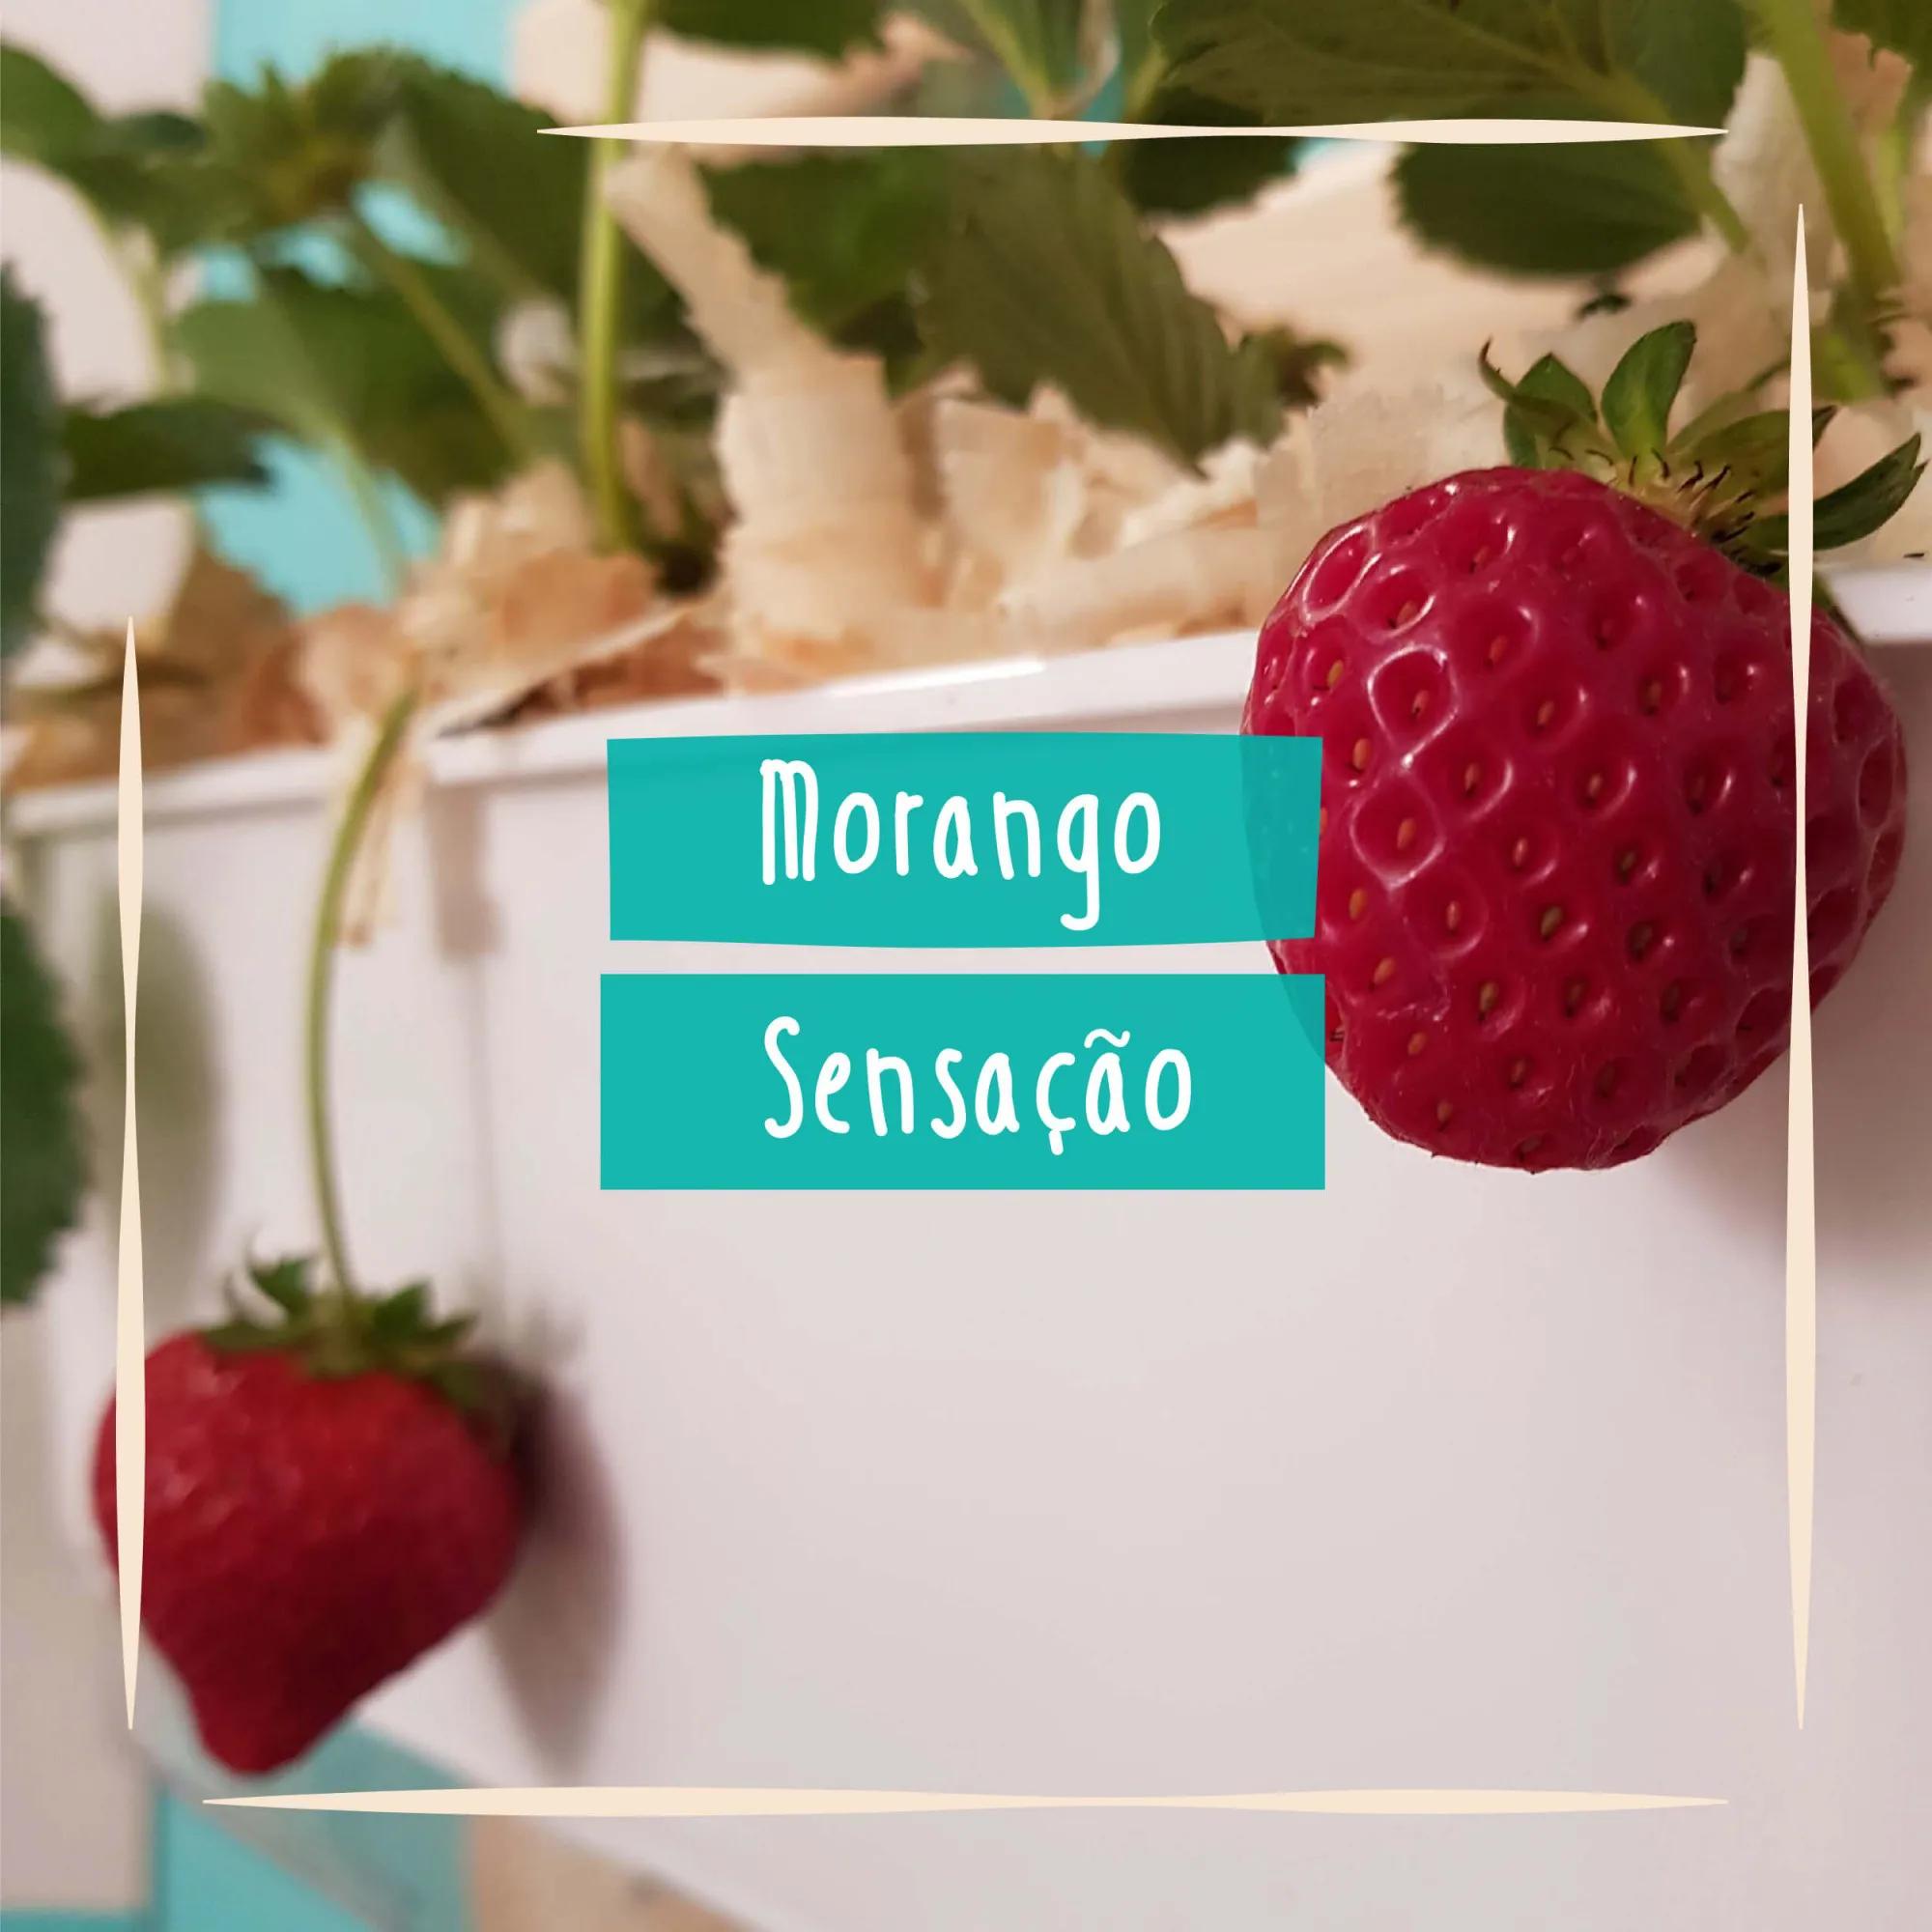 Sementes para plantar Morango Sensação em vasos autoirrigáveis RAIZ  - Vasos Raiz Loja Oficial